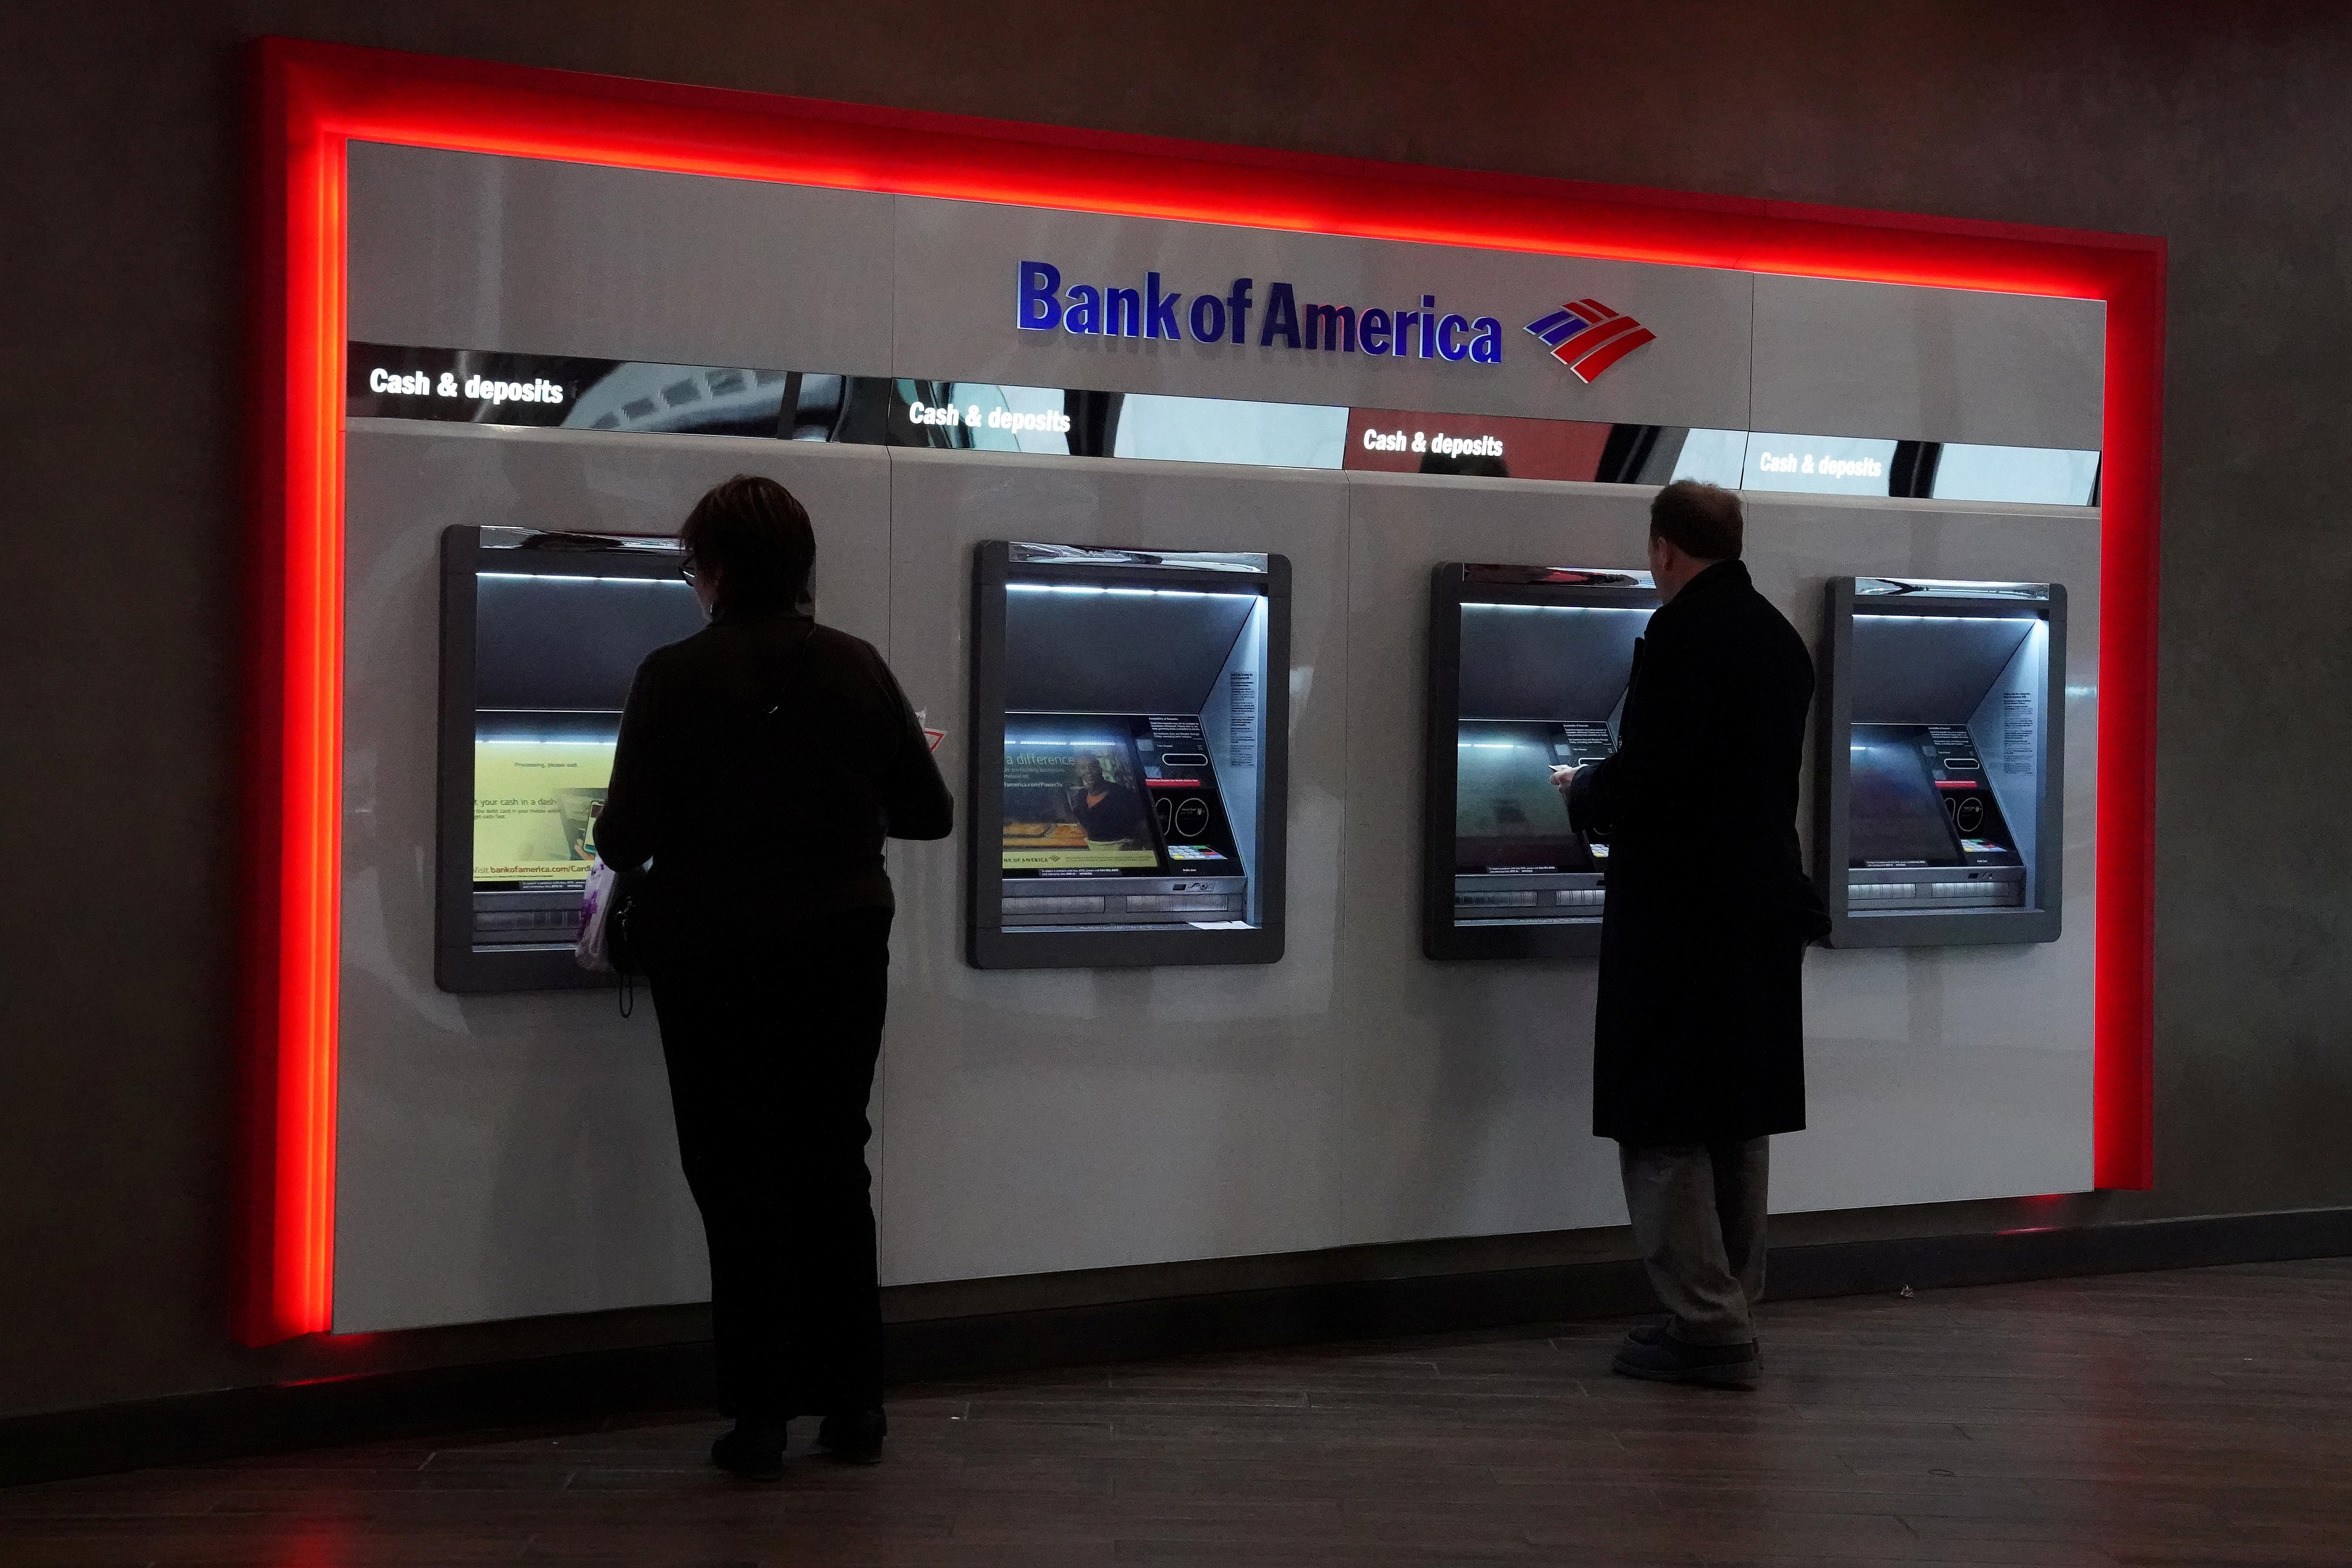 Bank of America ramps up branch modernization - Reuters